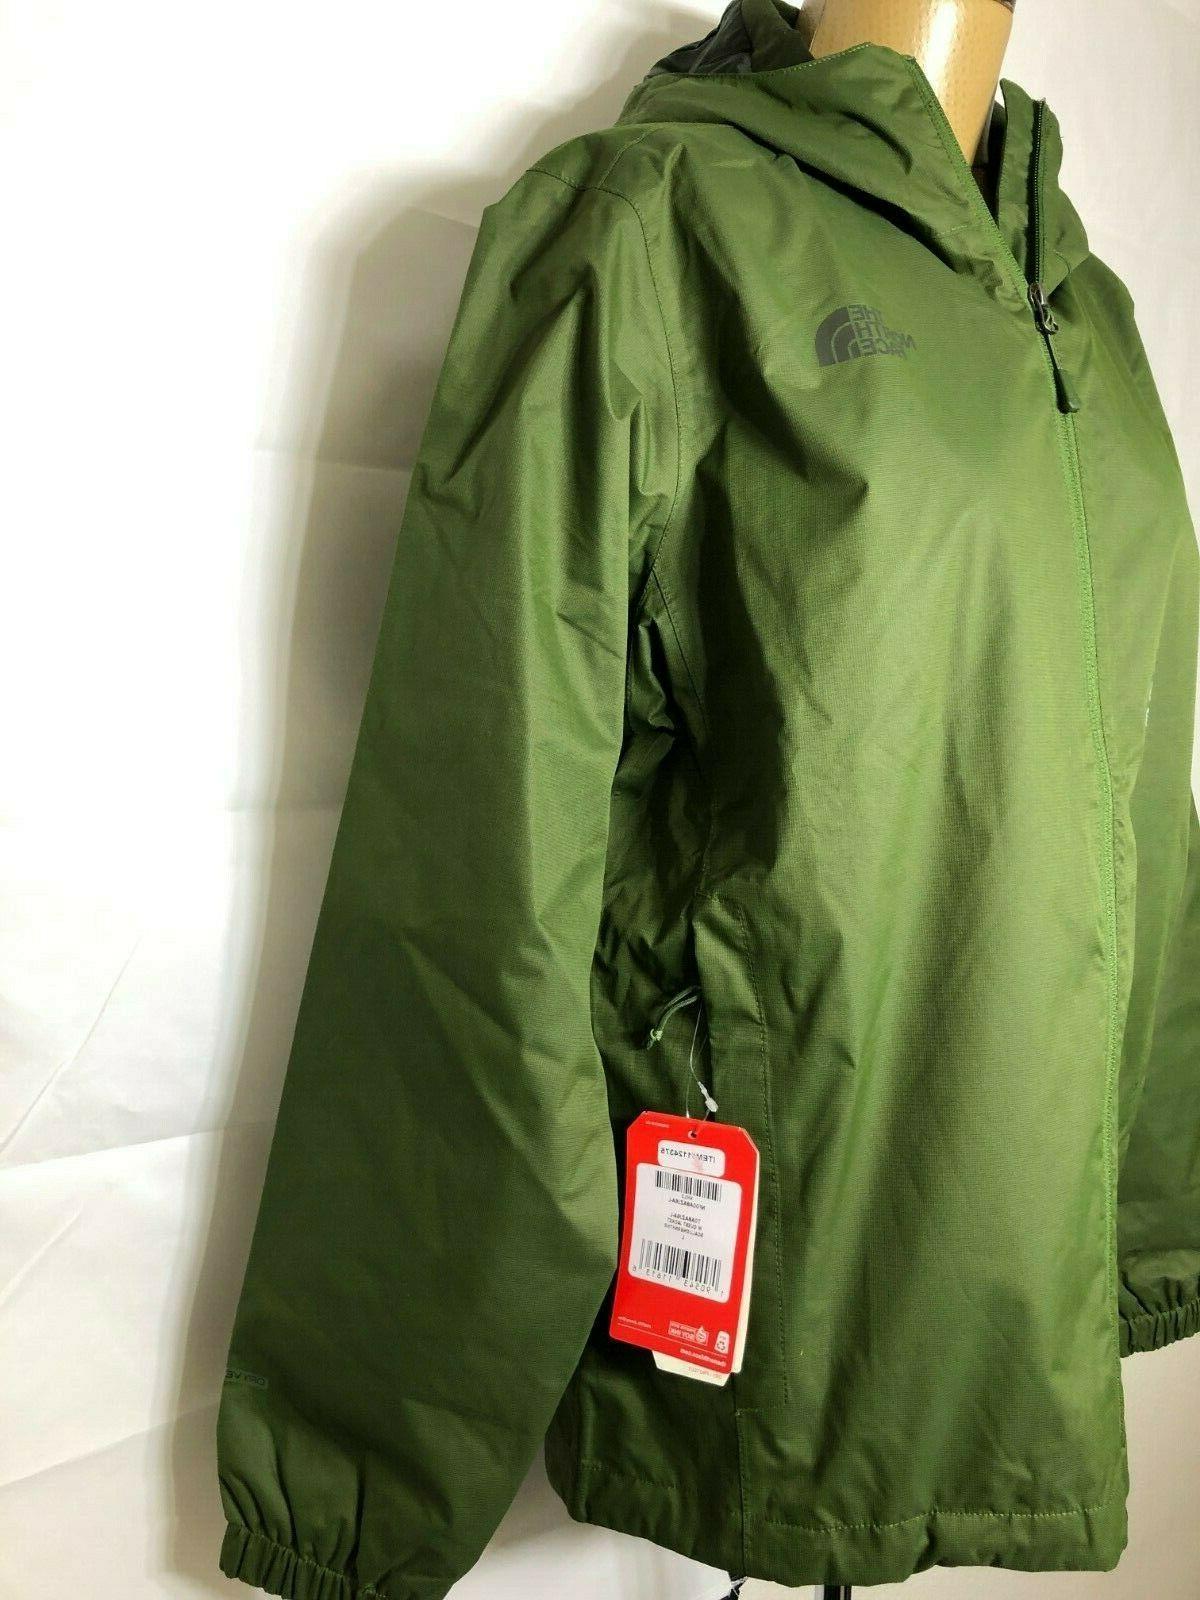 NWT Men's Green Quest Hooded Rain